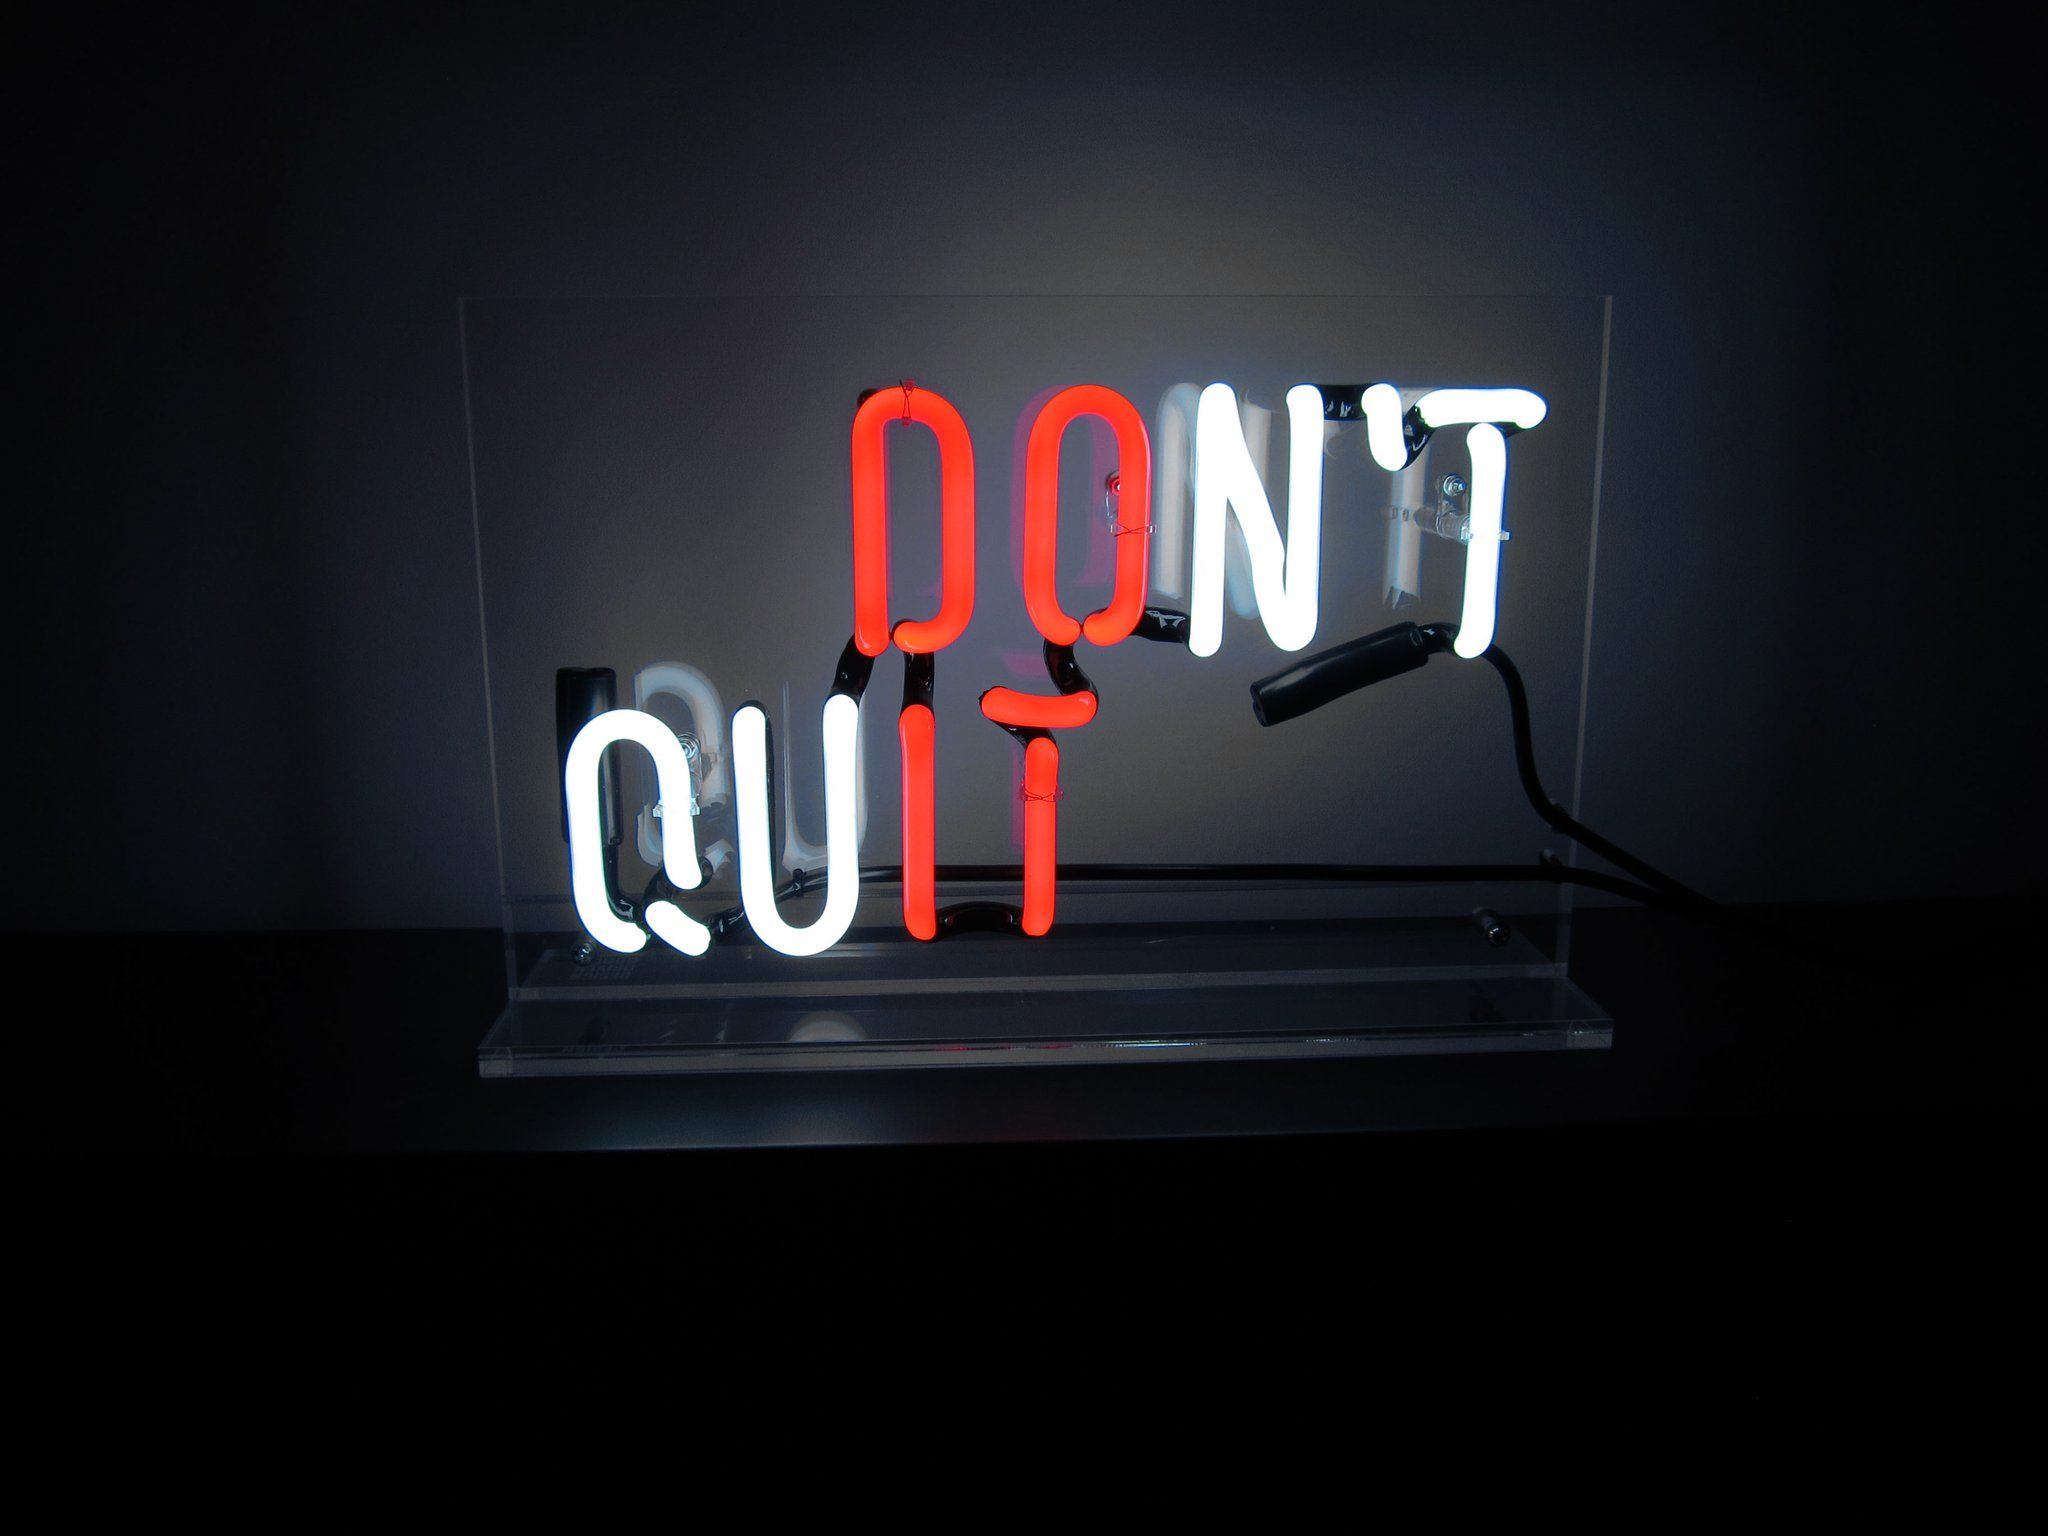 Motivation Neon Quotes Wallpaper